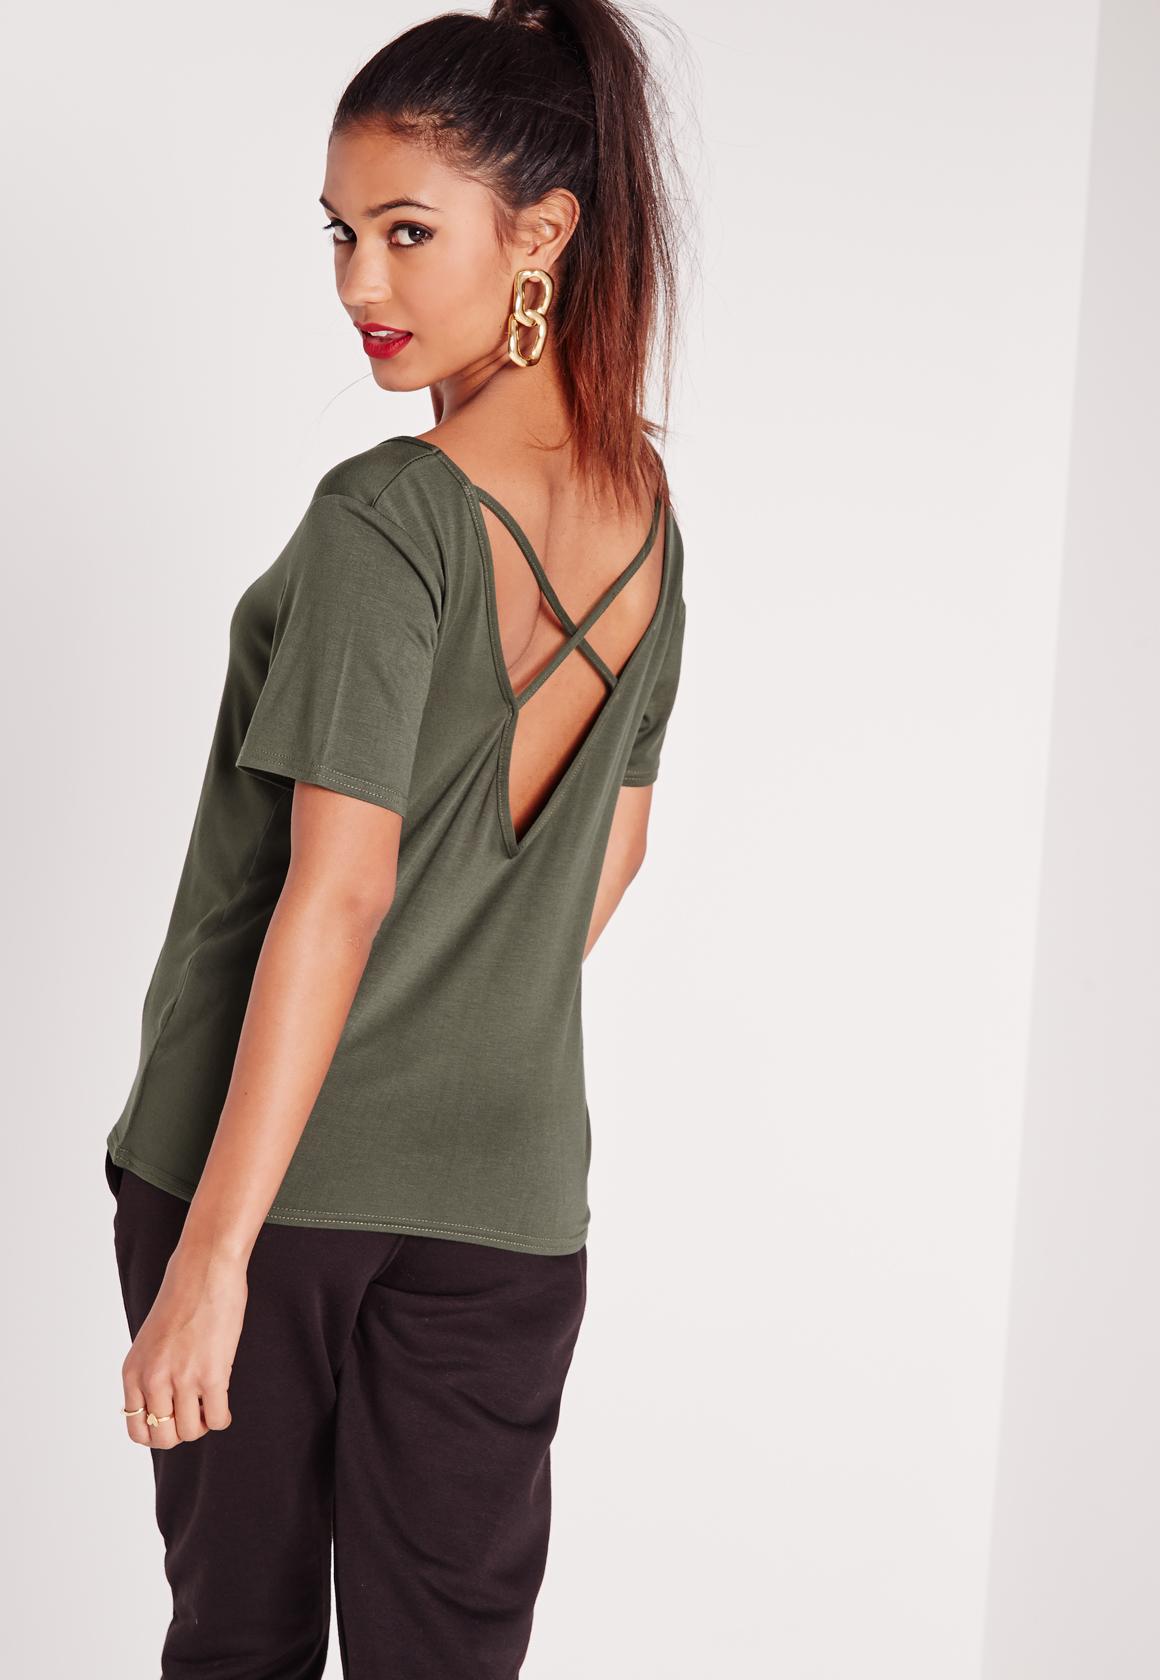 Shop online for Men's V-Neck T-Shirts at buzz24.ga Find designer long & short sleeve V-neck shirts. Free Shipping. Free Returns. All the time.